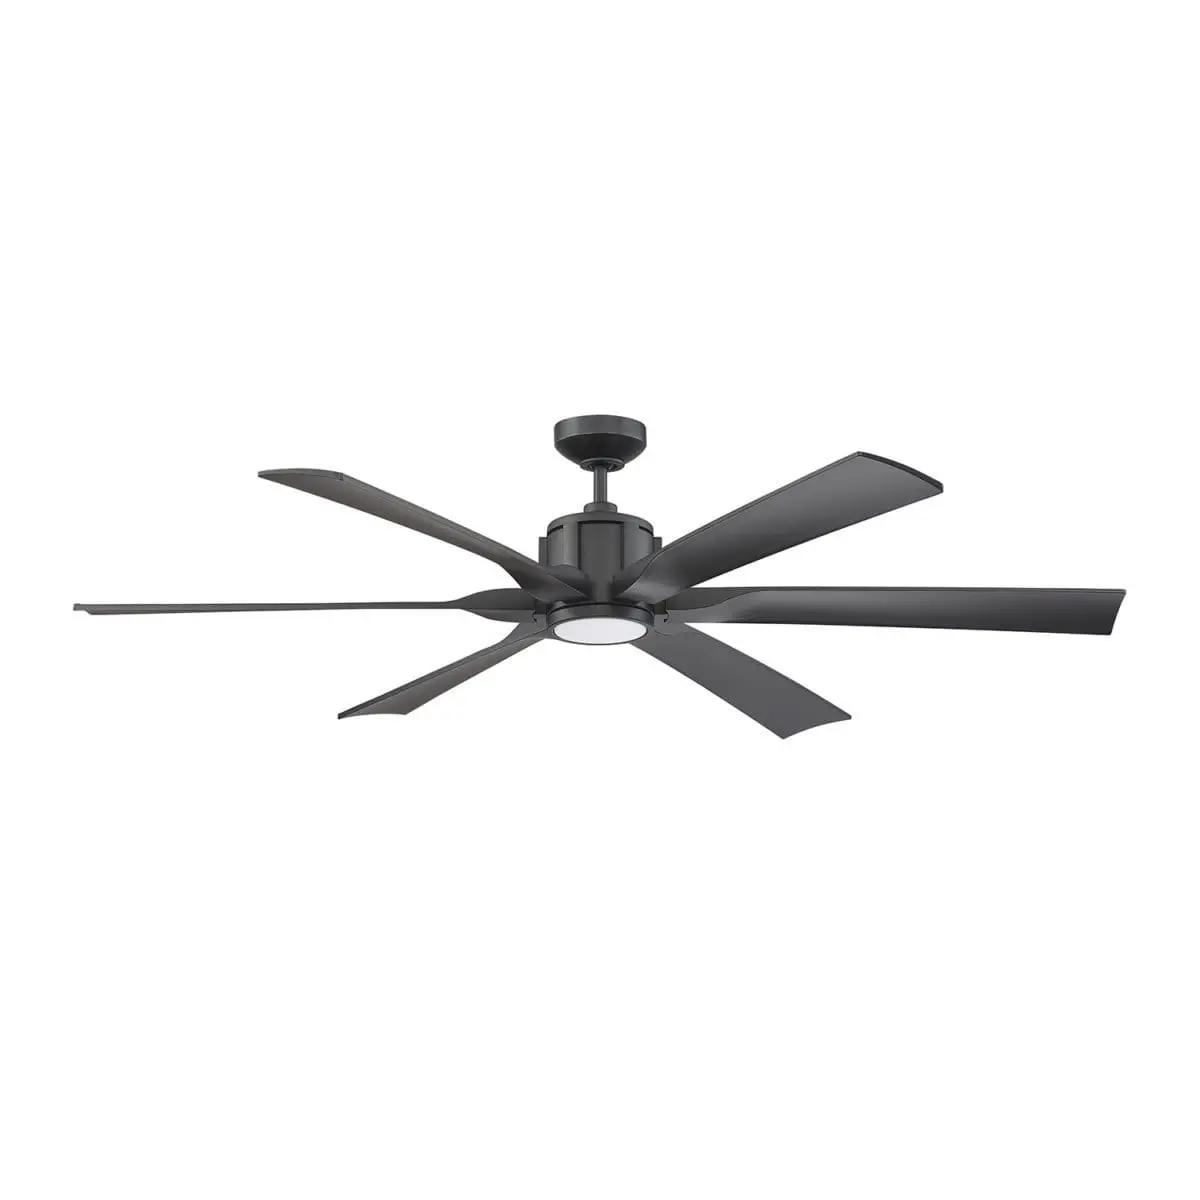 "148 AC23160 60""  in Black or Nickle Regular Price $979.99  Sale Price $616.99"